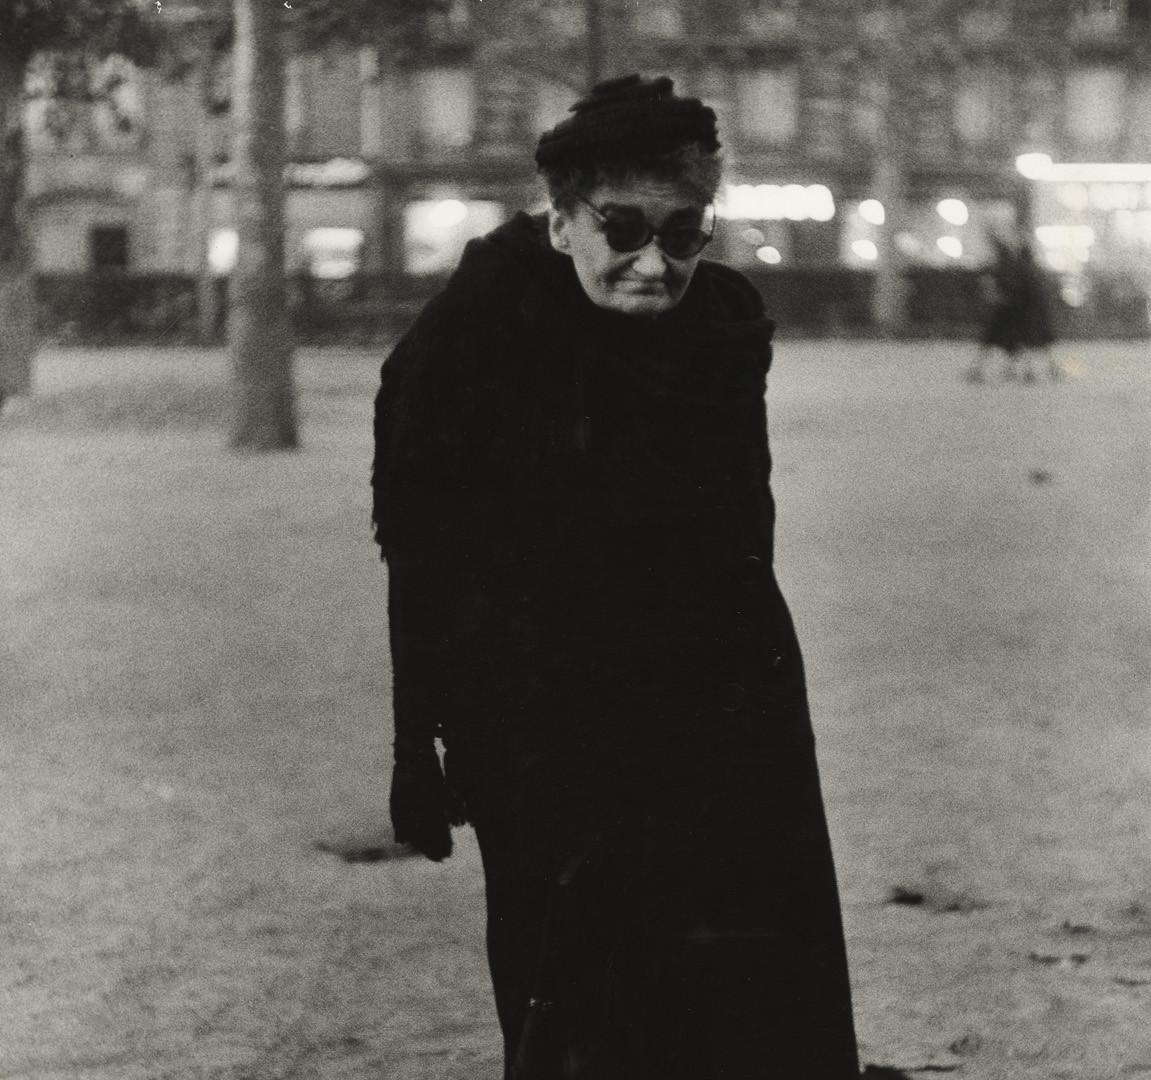 Christer Strömholm, Untitled, 1949